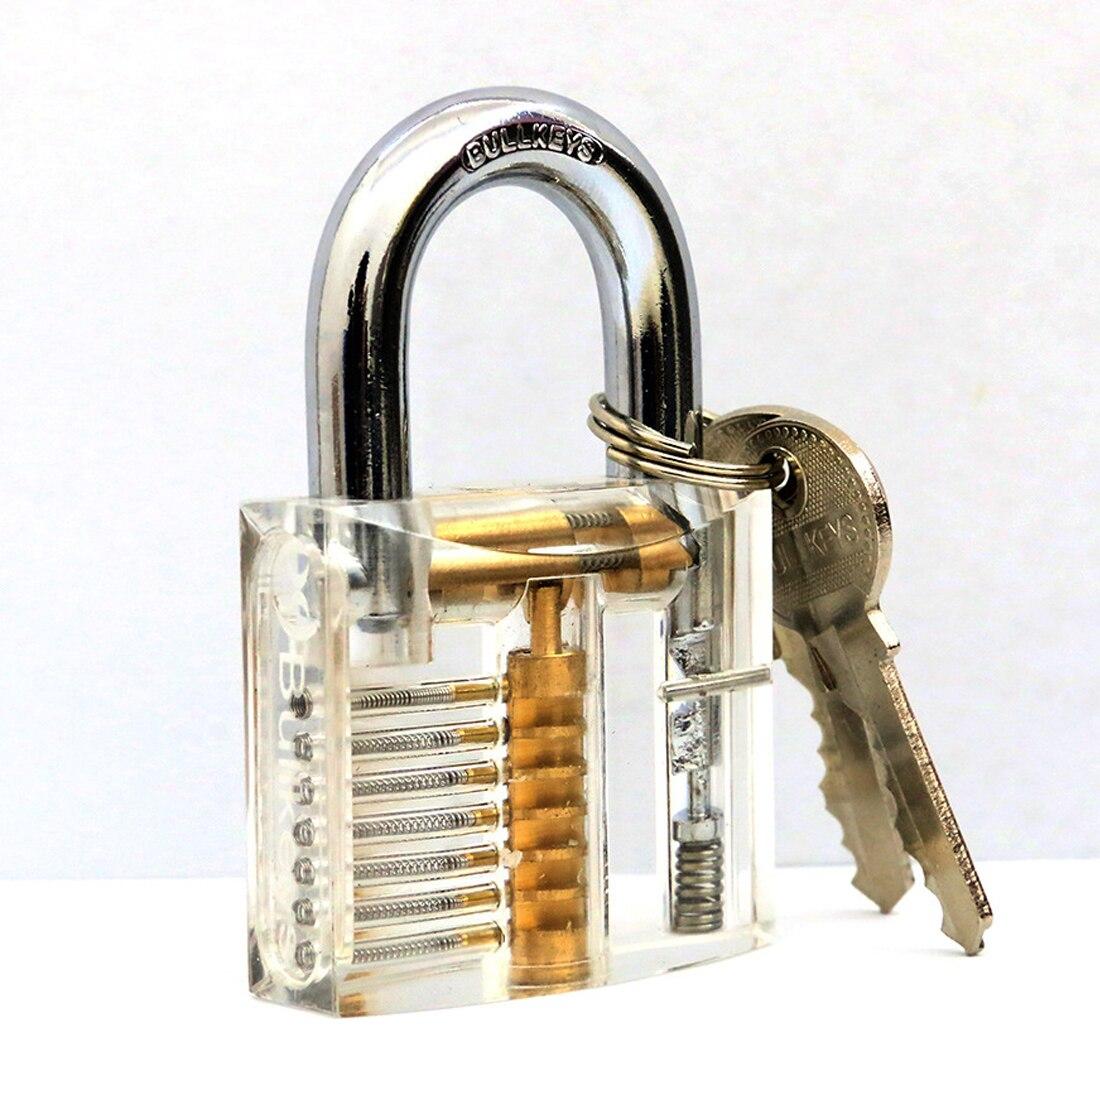 Promote Cutaway Inside View Of Practice Transparent Padlock Lock Training Skill Pick View Padlock For Locksmith With Smart Keys